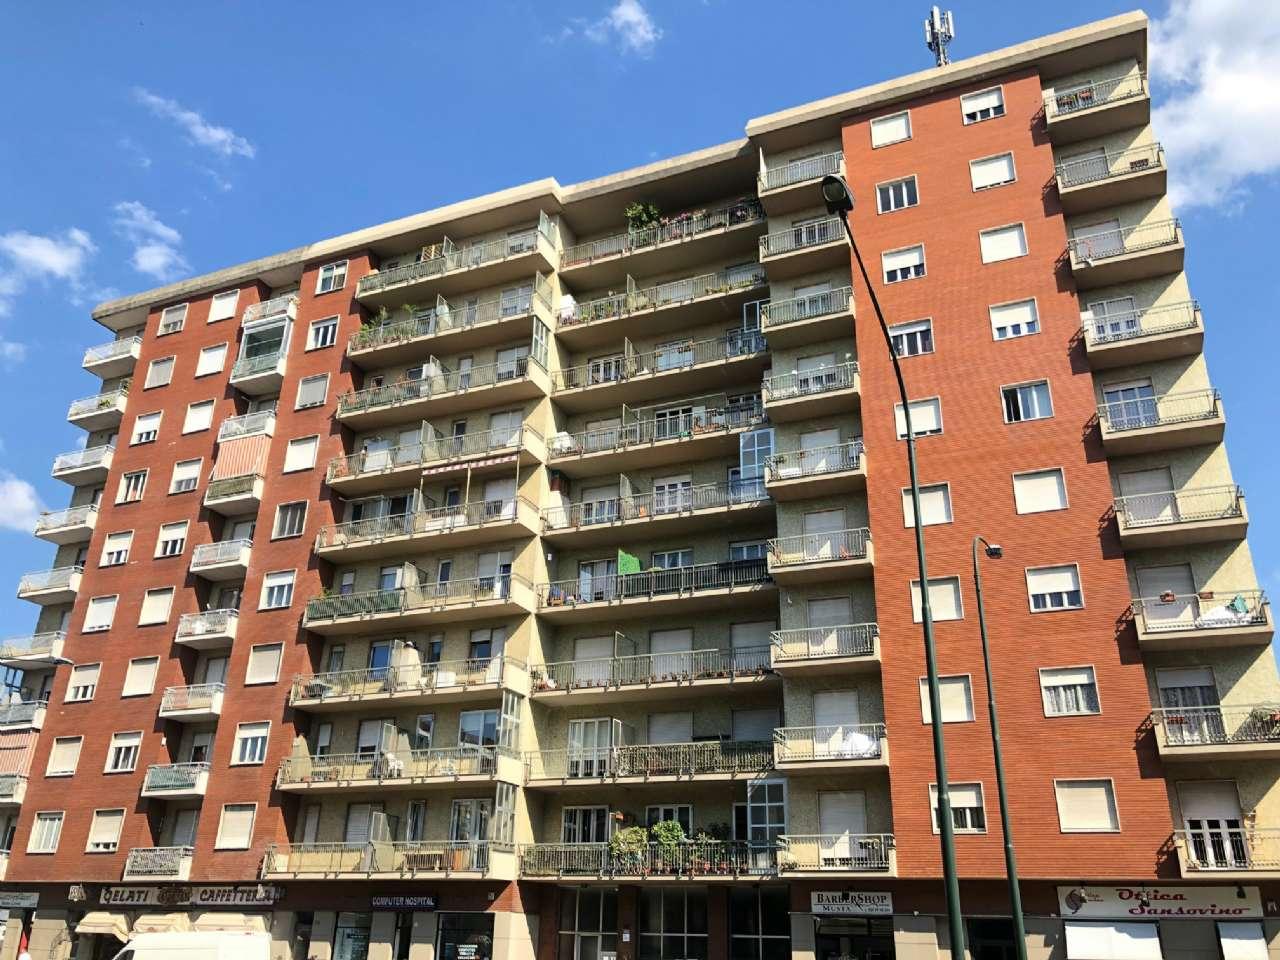 Appartamento in vendita Zona Lucento, Vallette - via sansovino 114 Torino